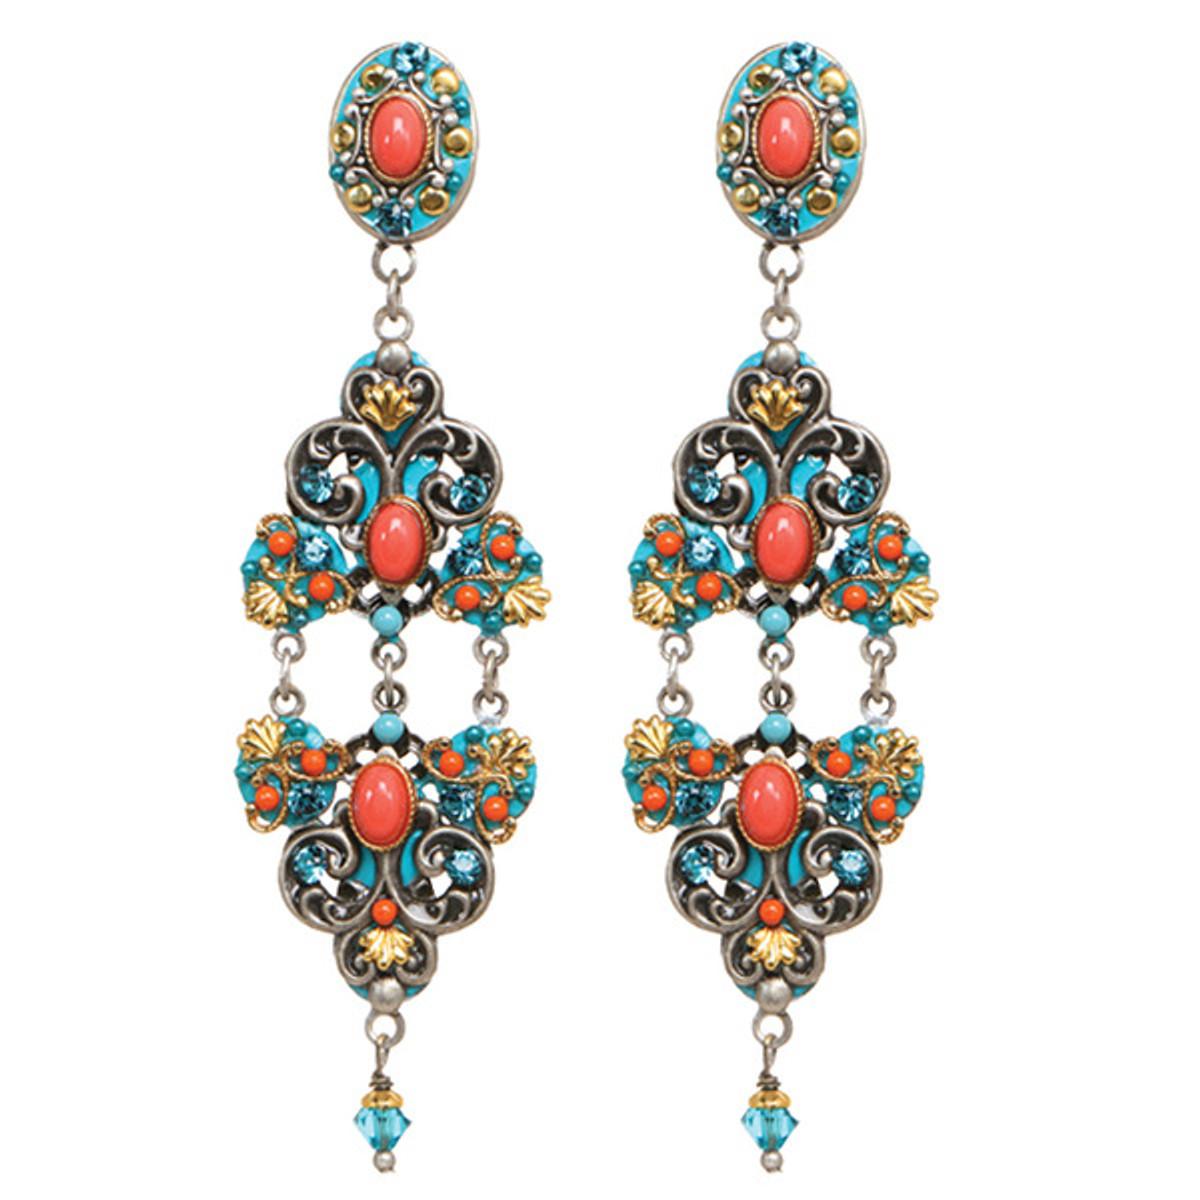 Michal Golan 3 Part Coral Sea Earrings